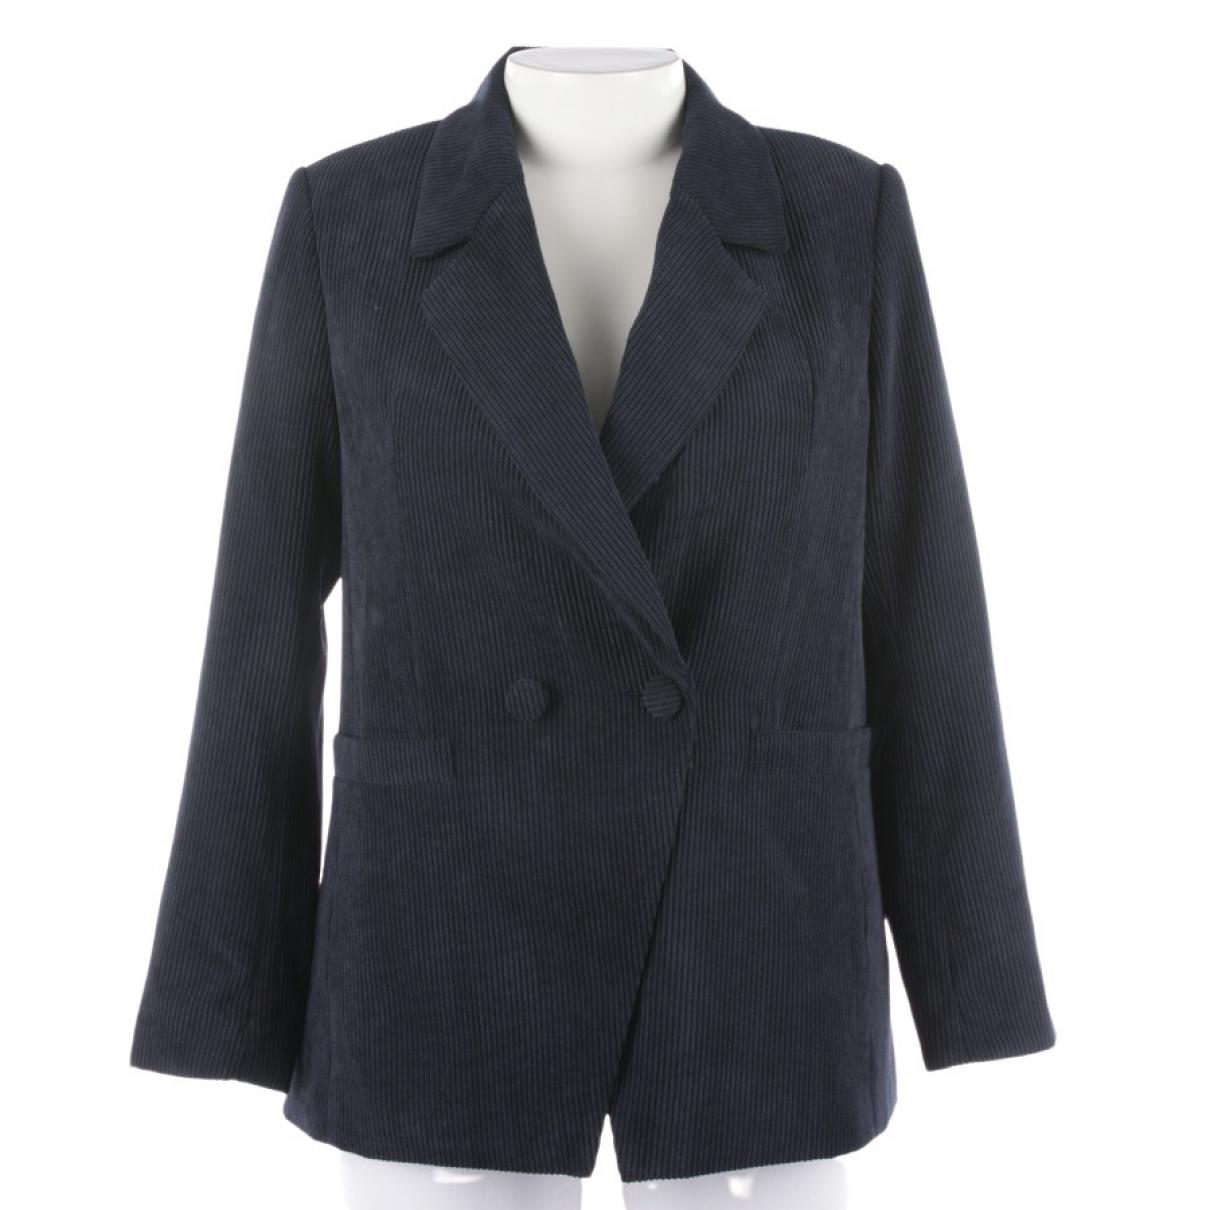 Anine Bing \N Blue jacket for Women XL International